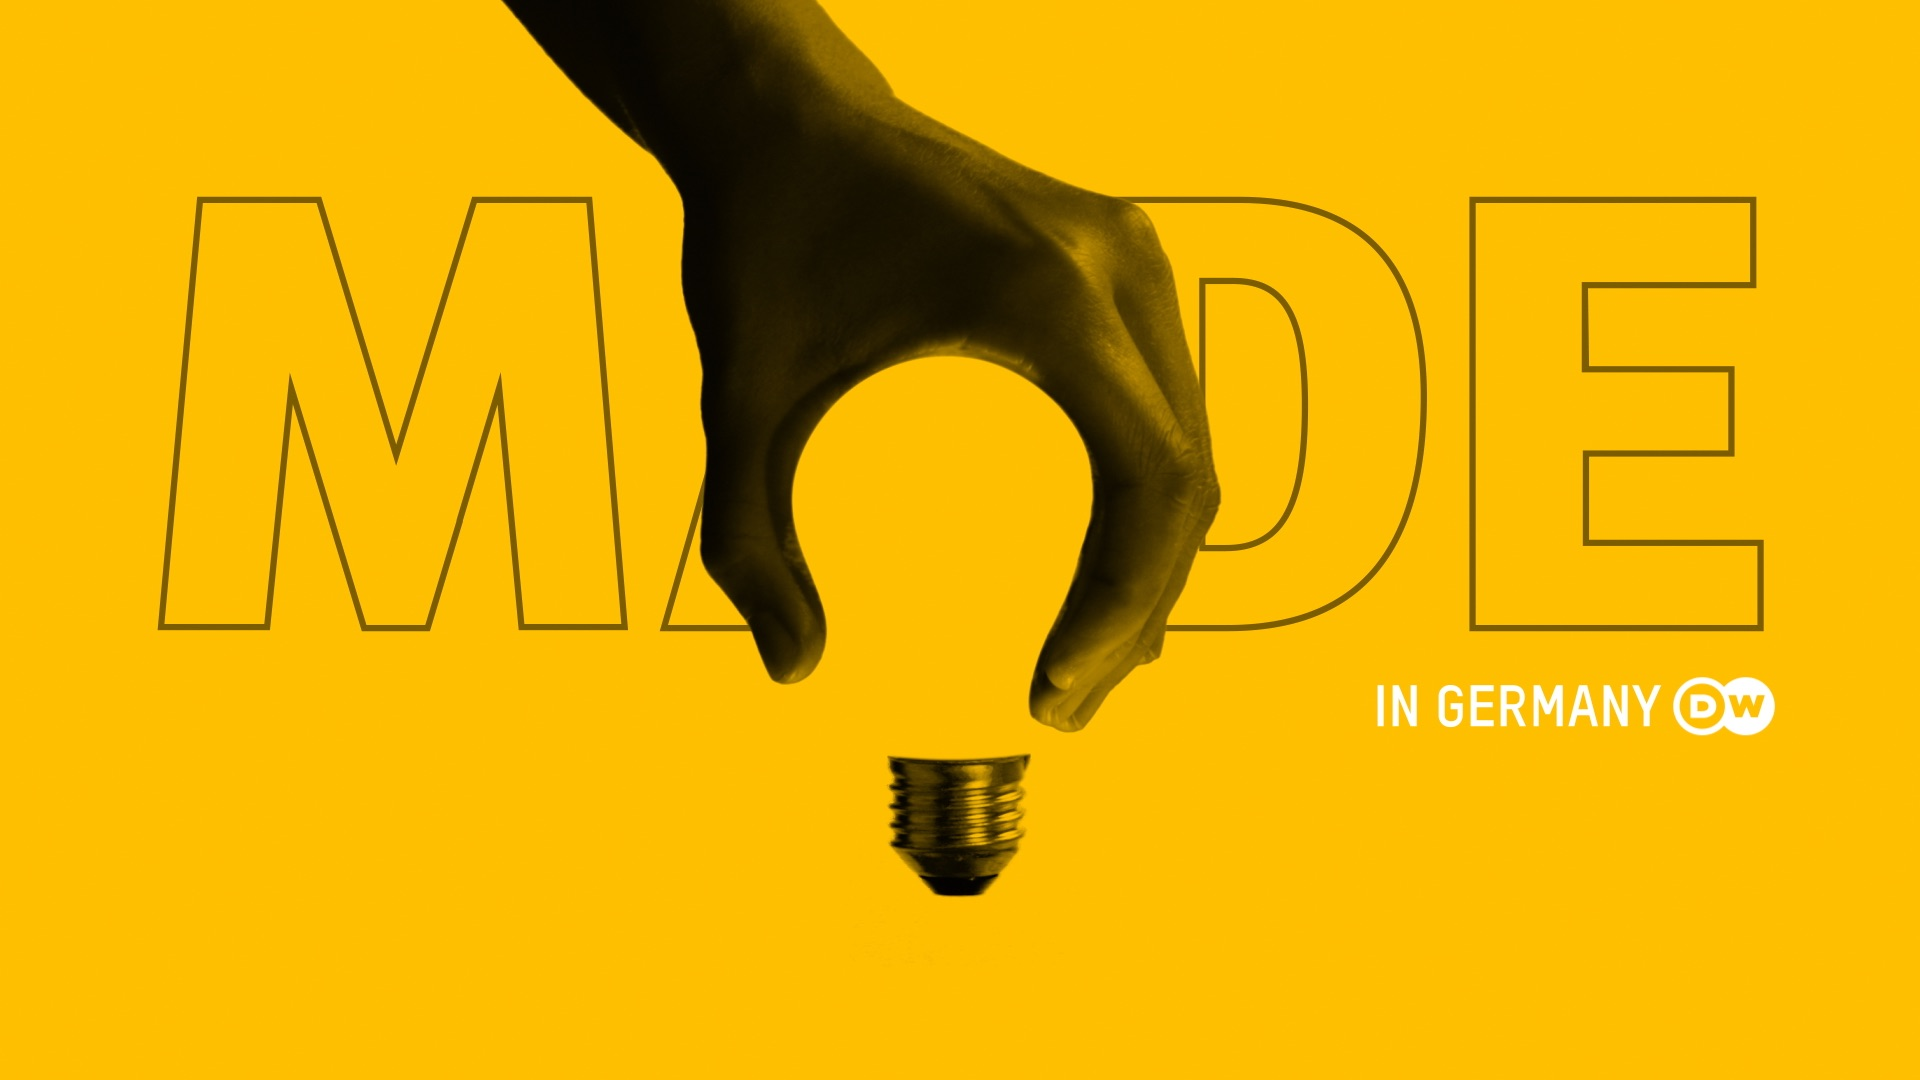 DW MADE Lamp in germany logo design brand branding channel